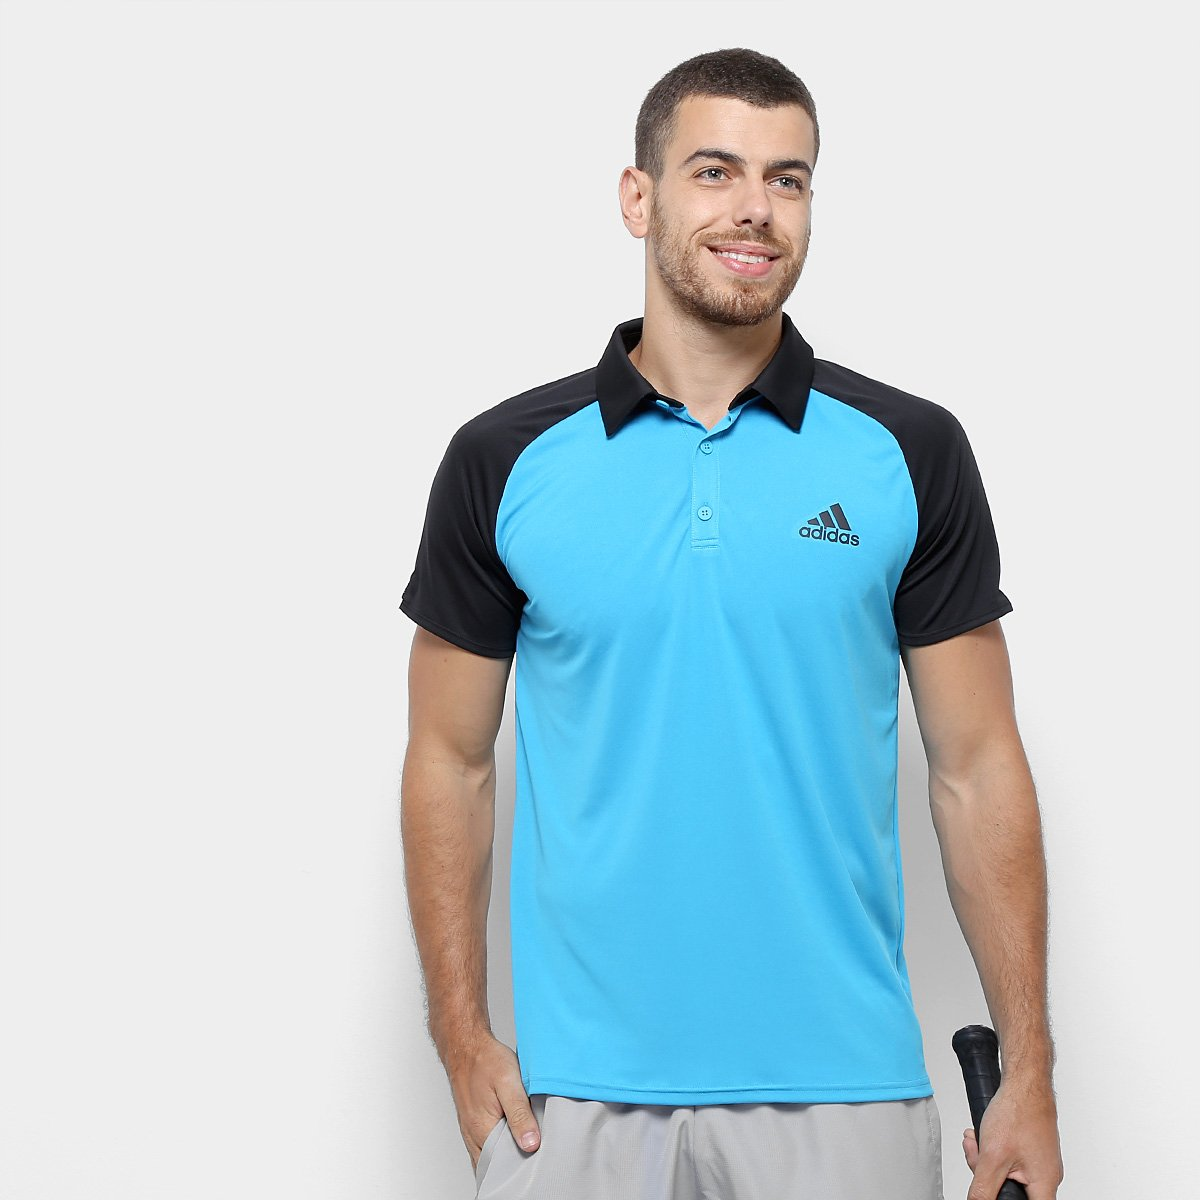 947a0922abb Camiseta Polo Adidas Club TD Masculina